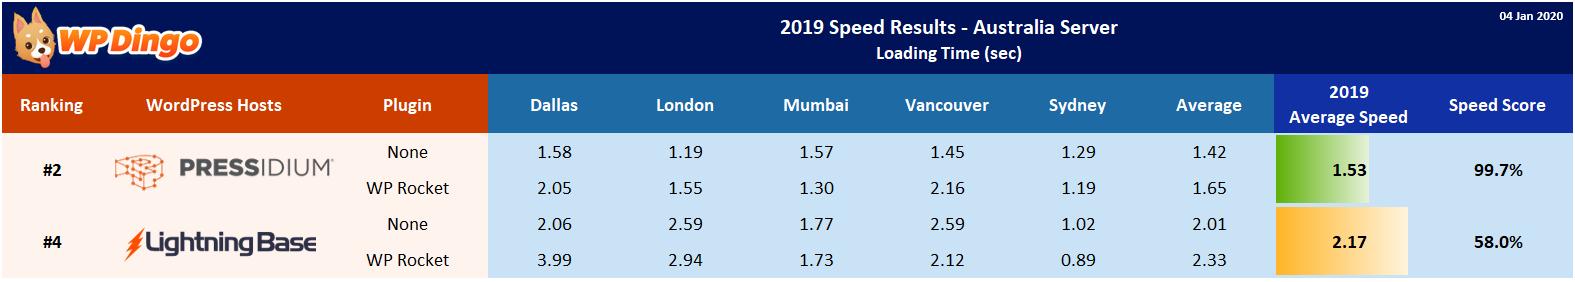 2019 Lightning Base vs Pressidium Speed Table - Australia Server